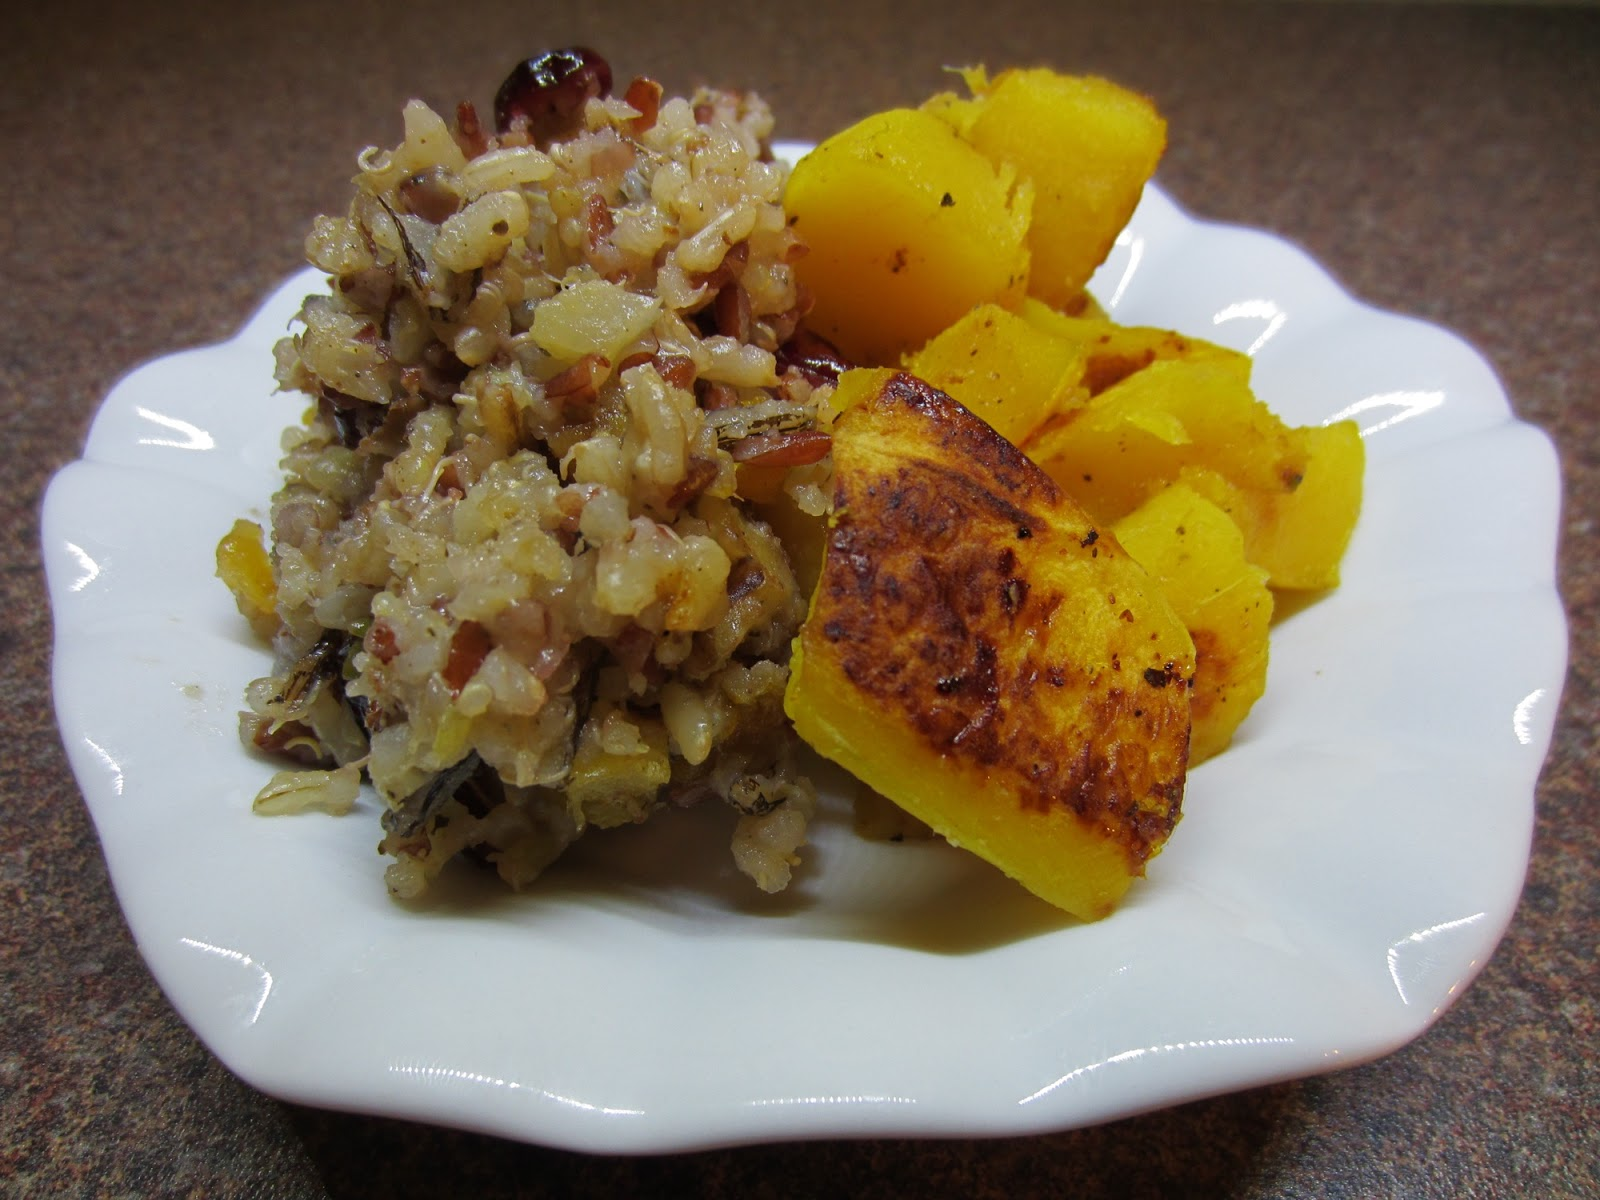 Trobairitz' Table d'hote: Quinoa and Wild Rice Stuffed Squash